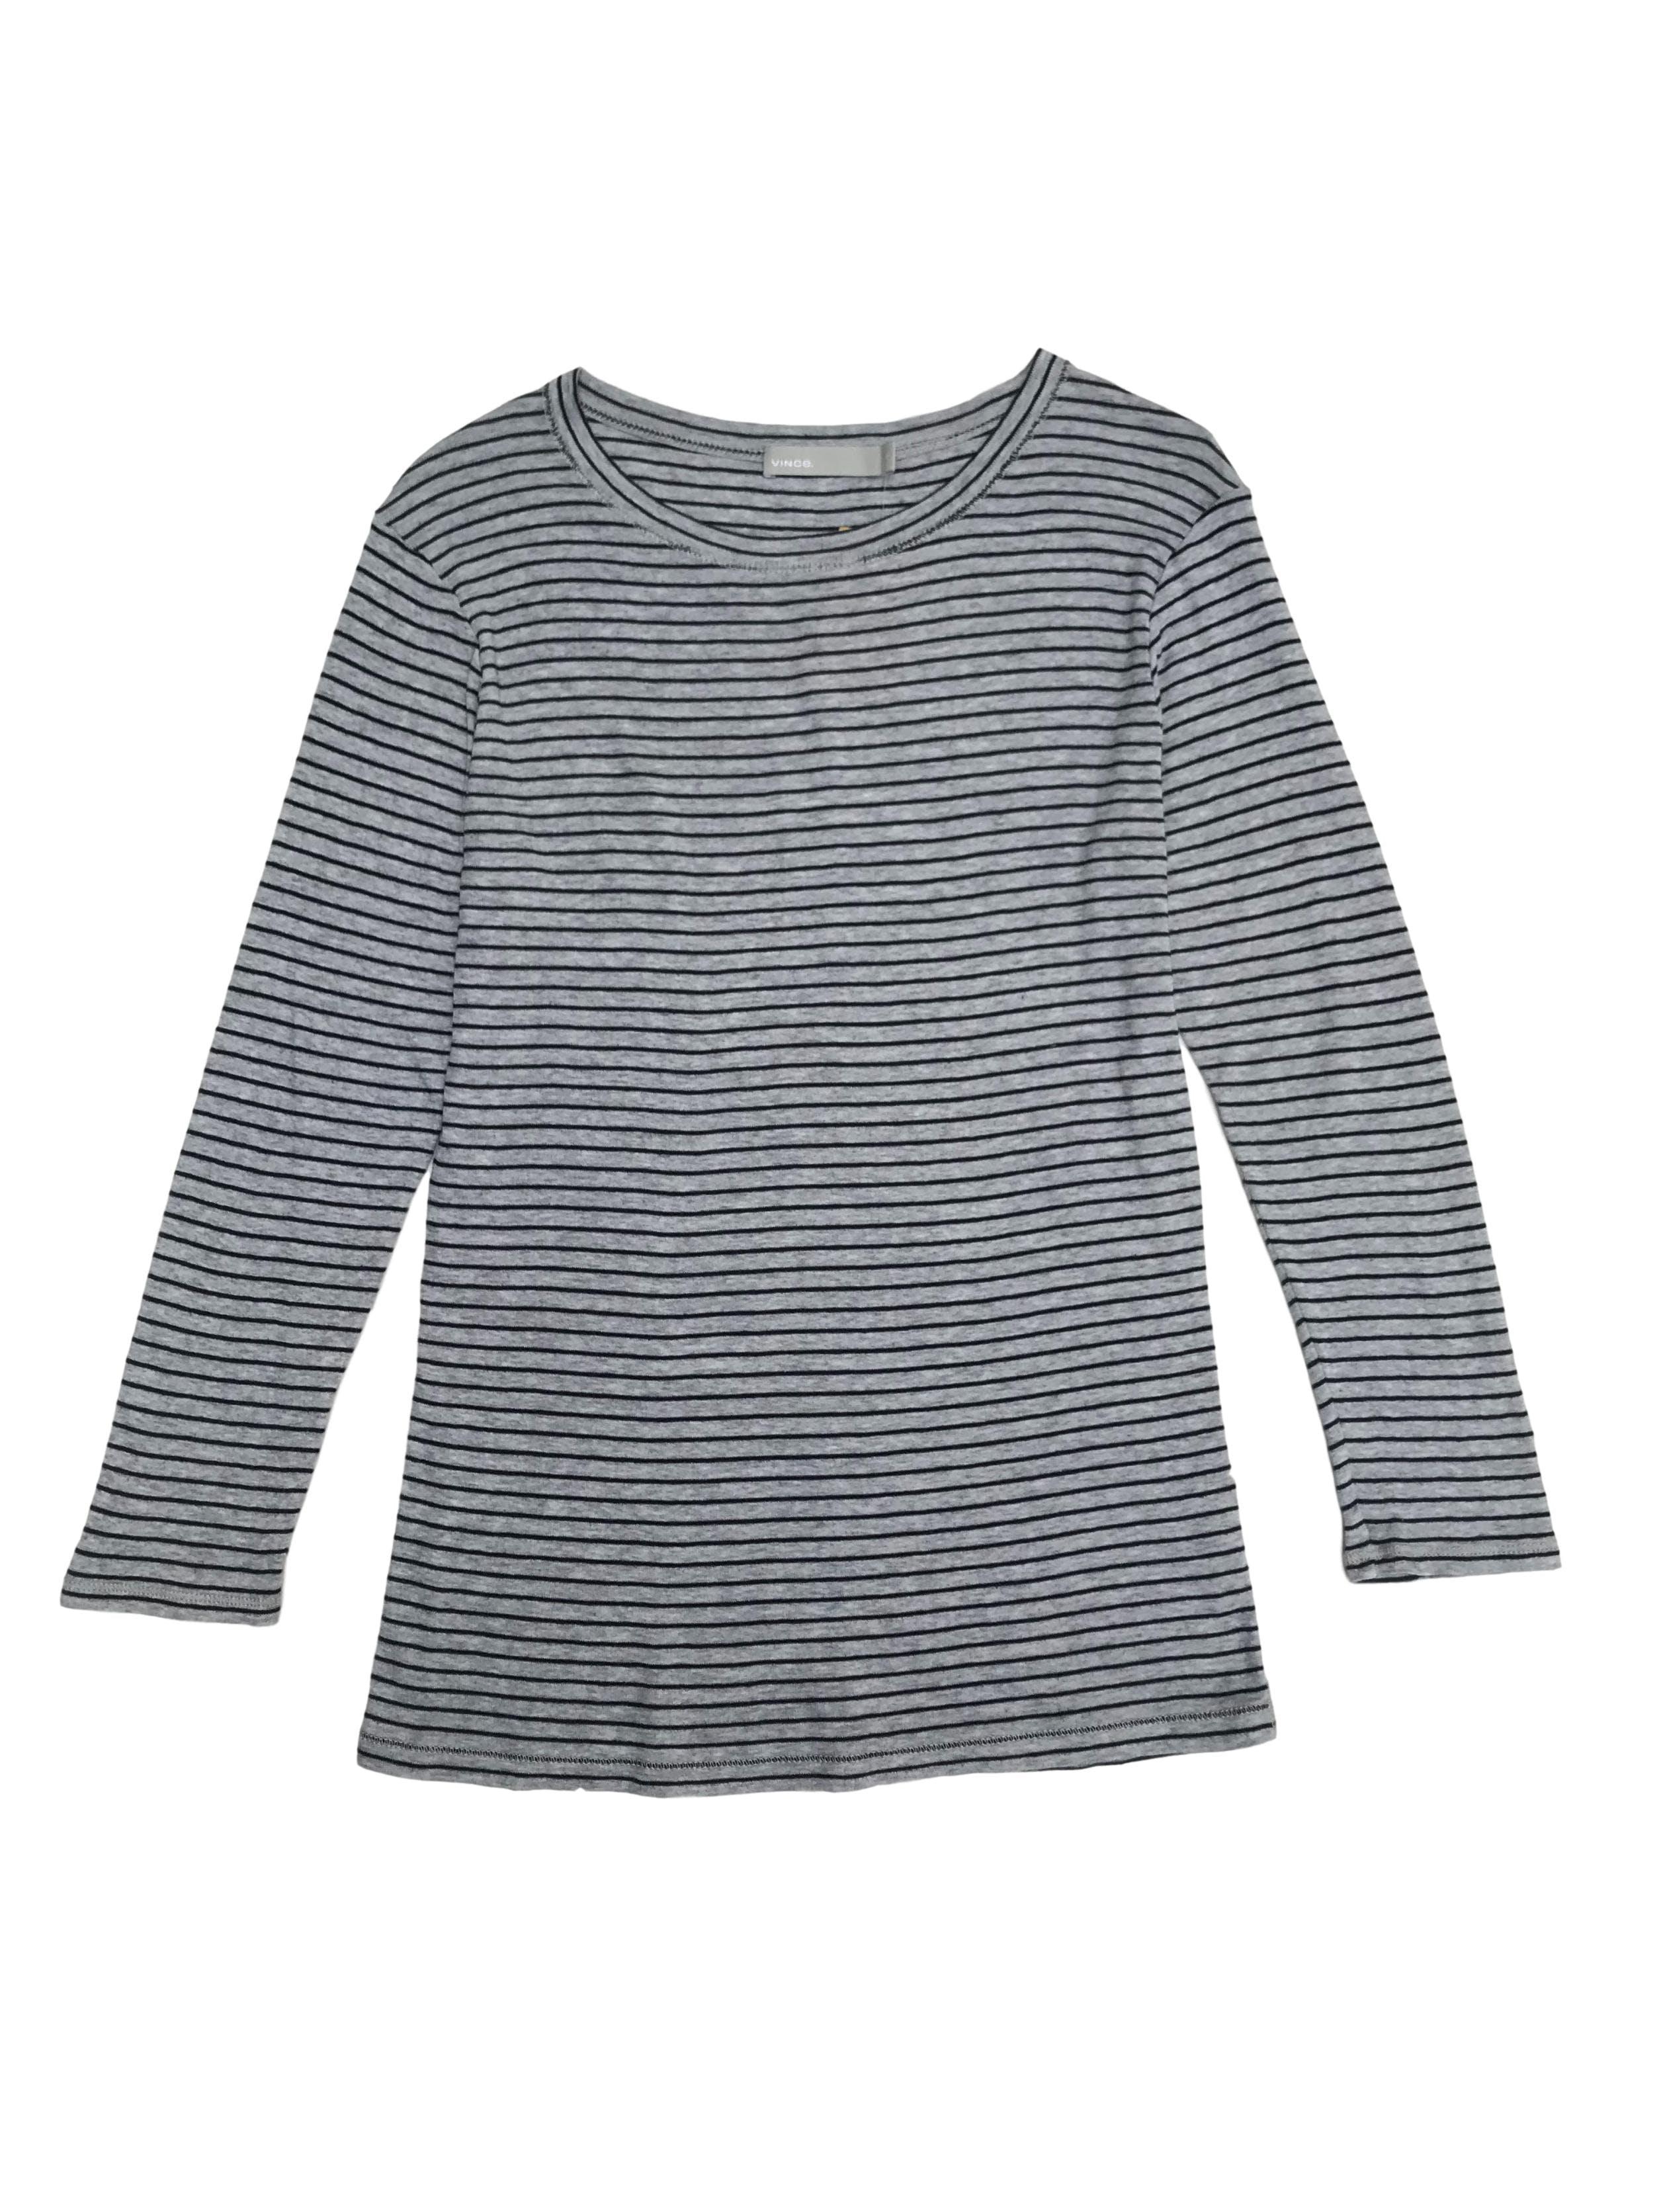 Polo Vince 100% algodón pima plomo con líneas negras, manga 3/4. Precio original S/ 300